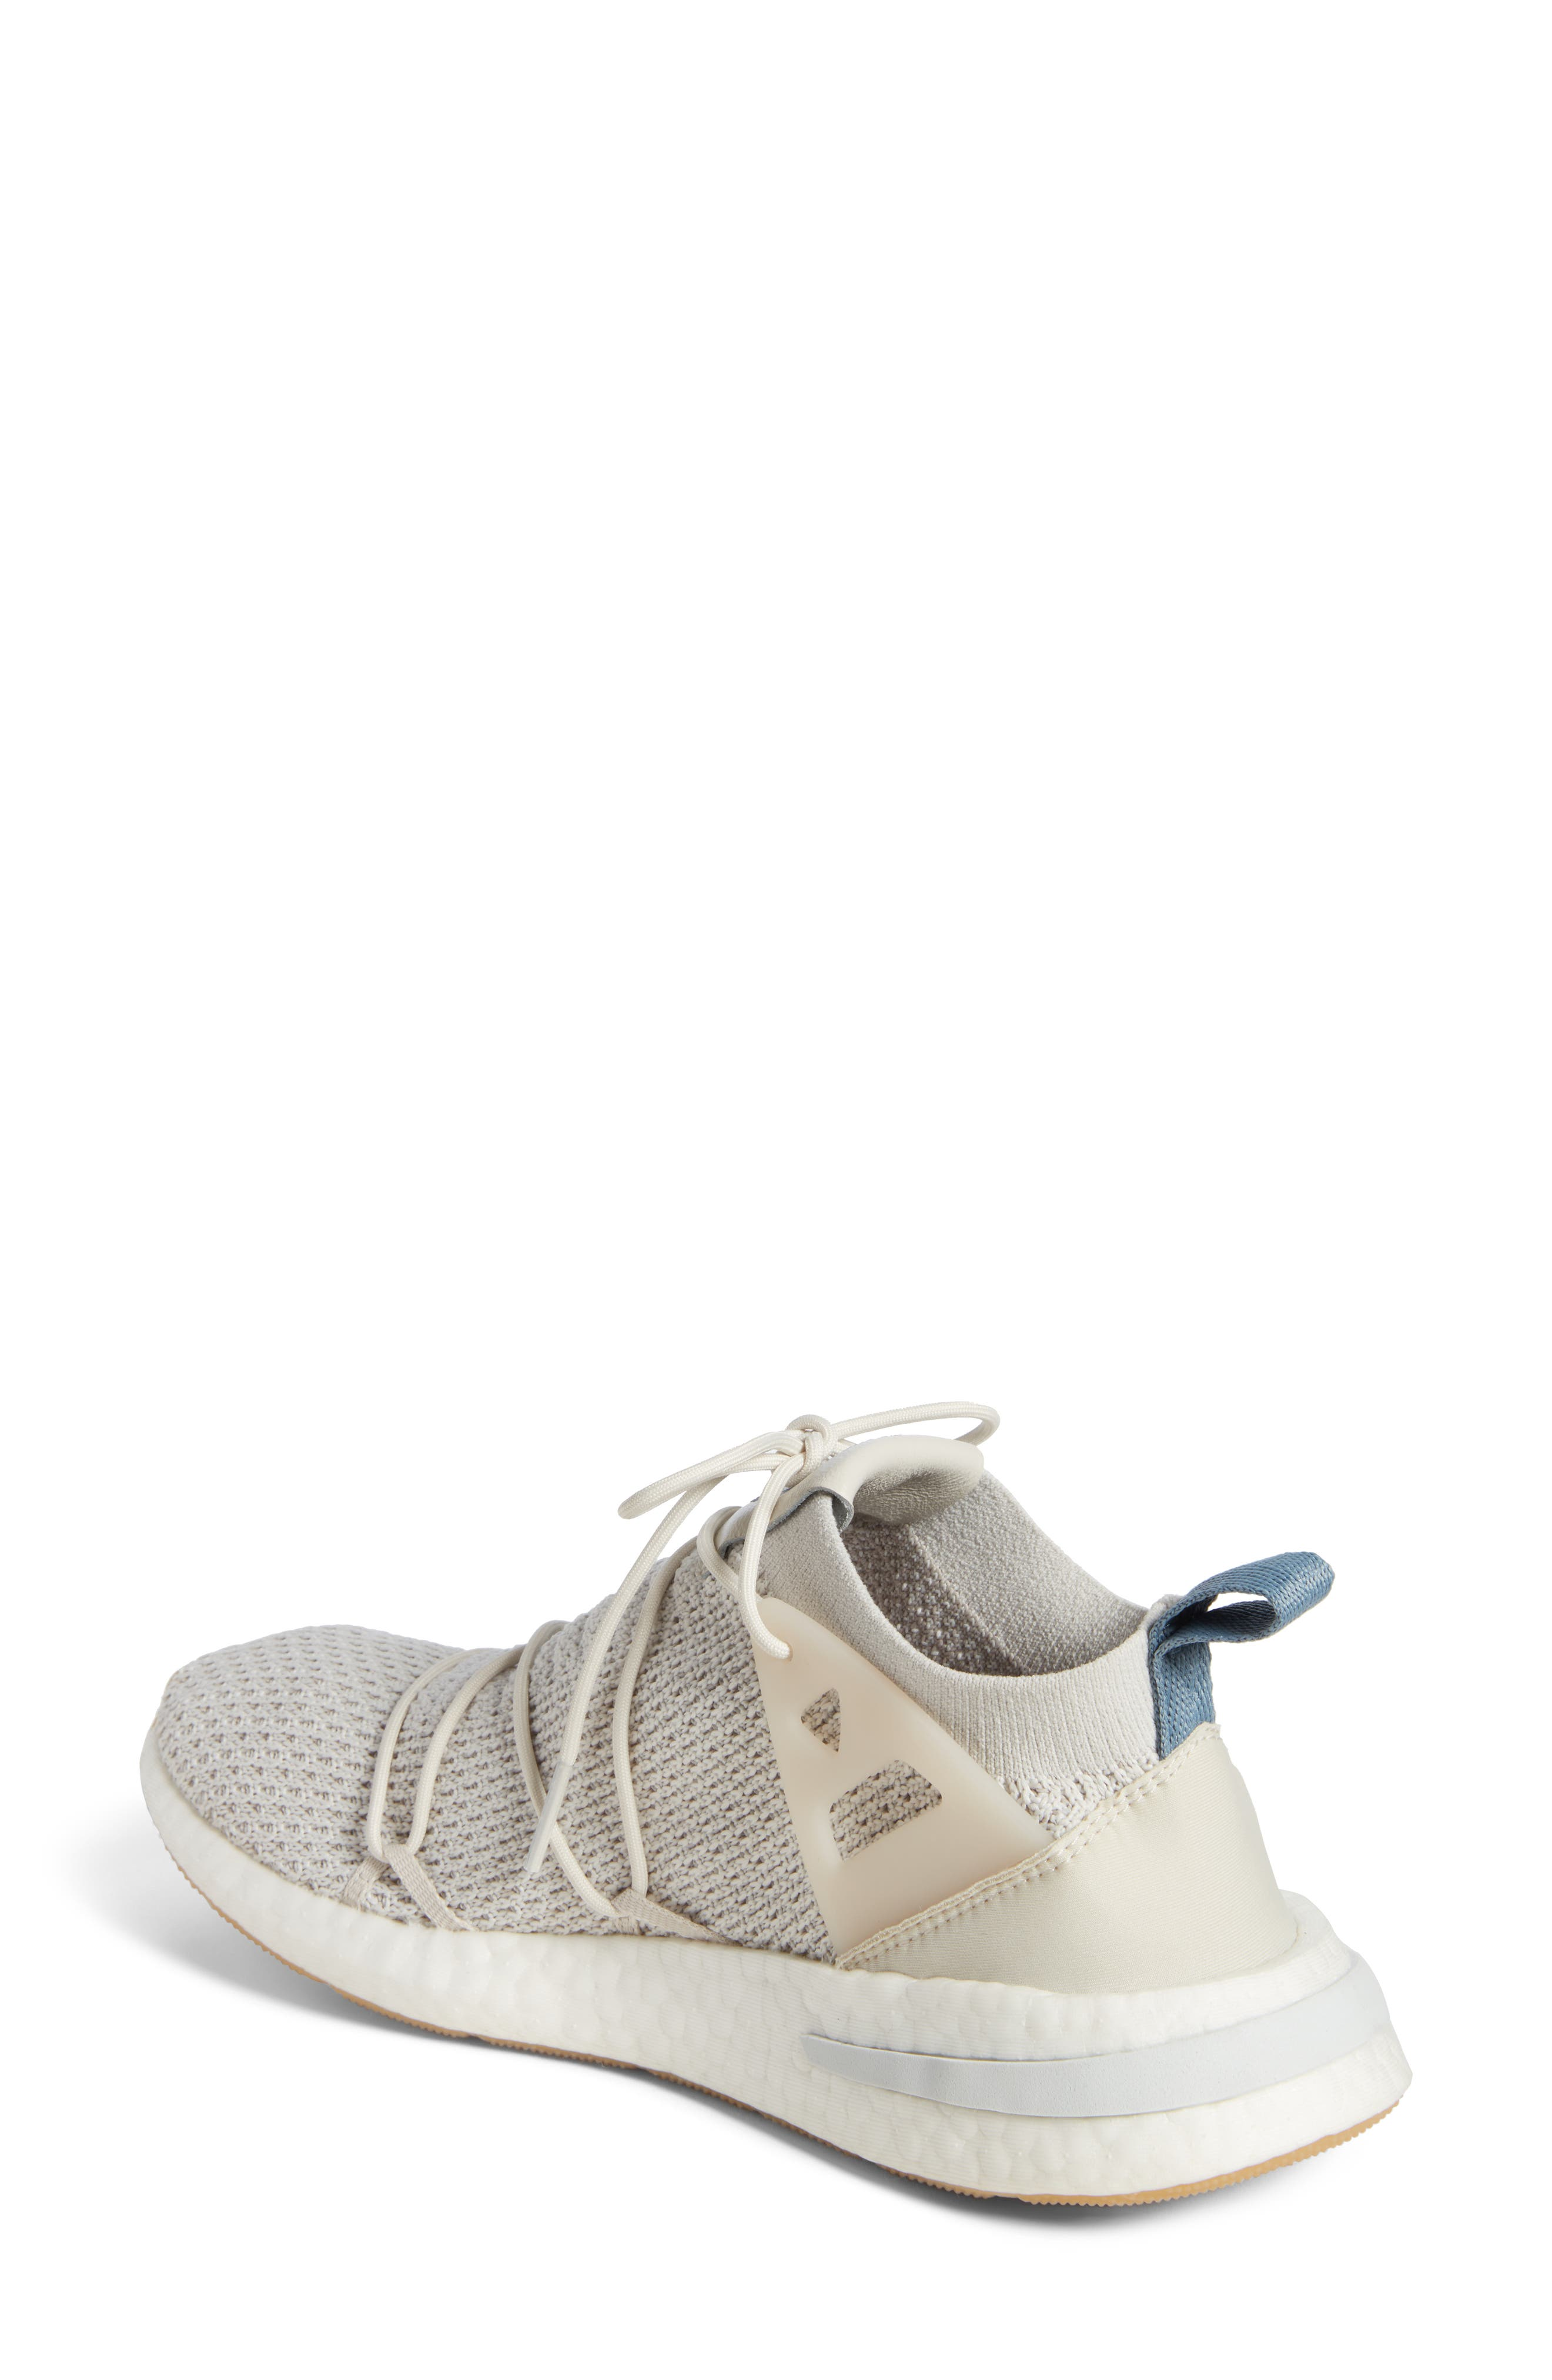 Arkyn Primeknit Sneaker,                             Alternate thumbnail 2, color,                             TALC/ TALC/ LINEN